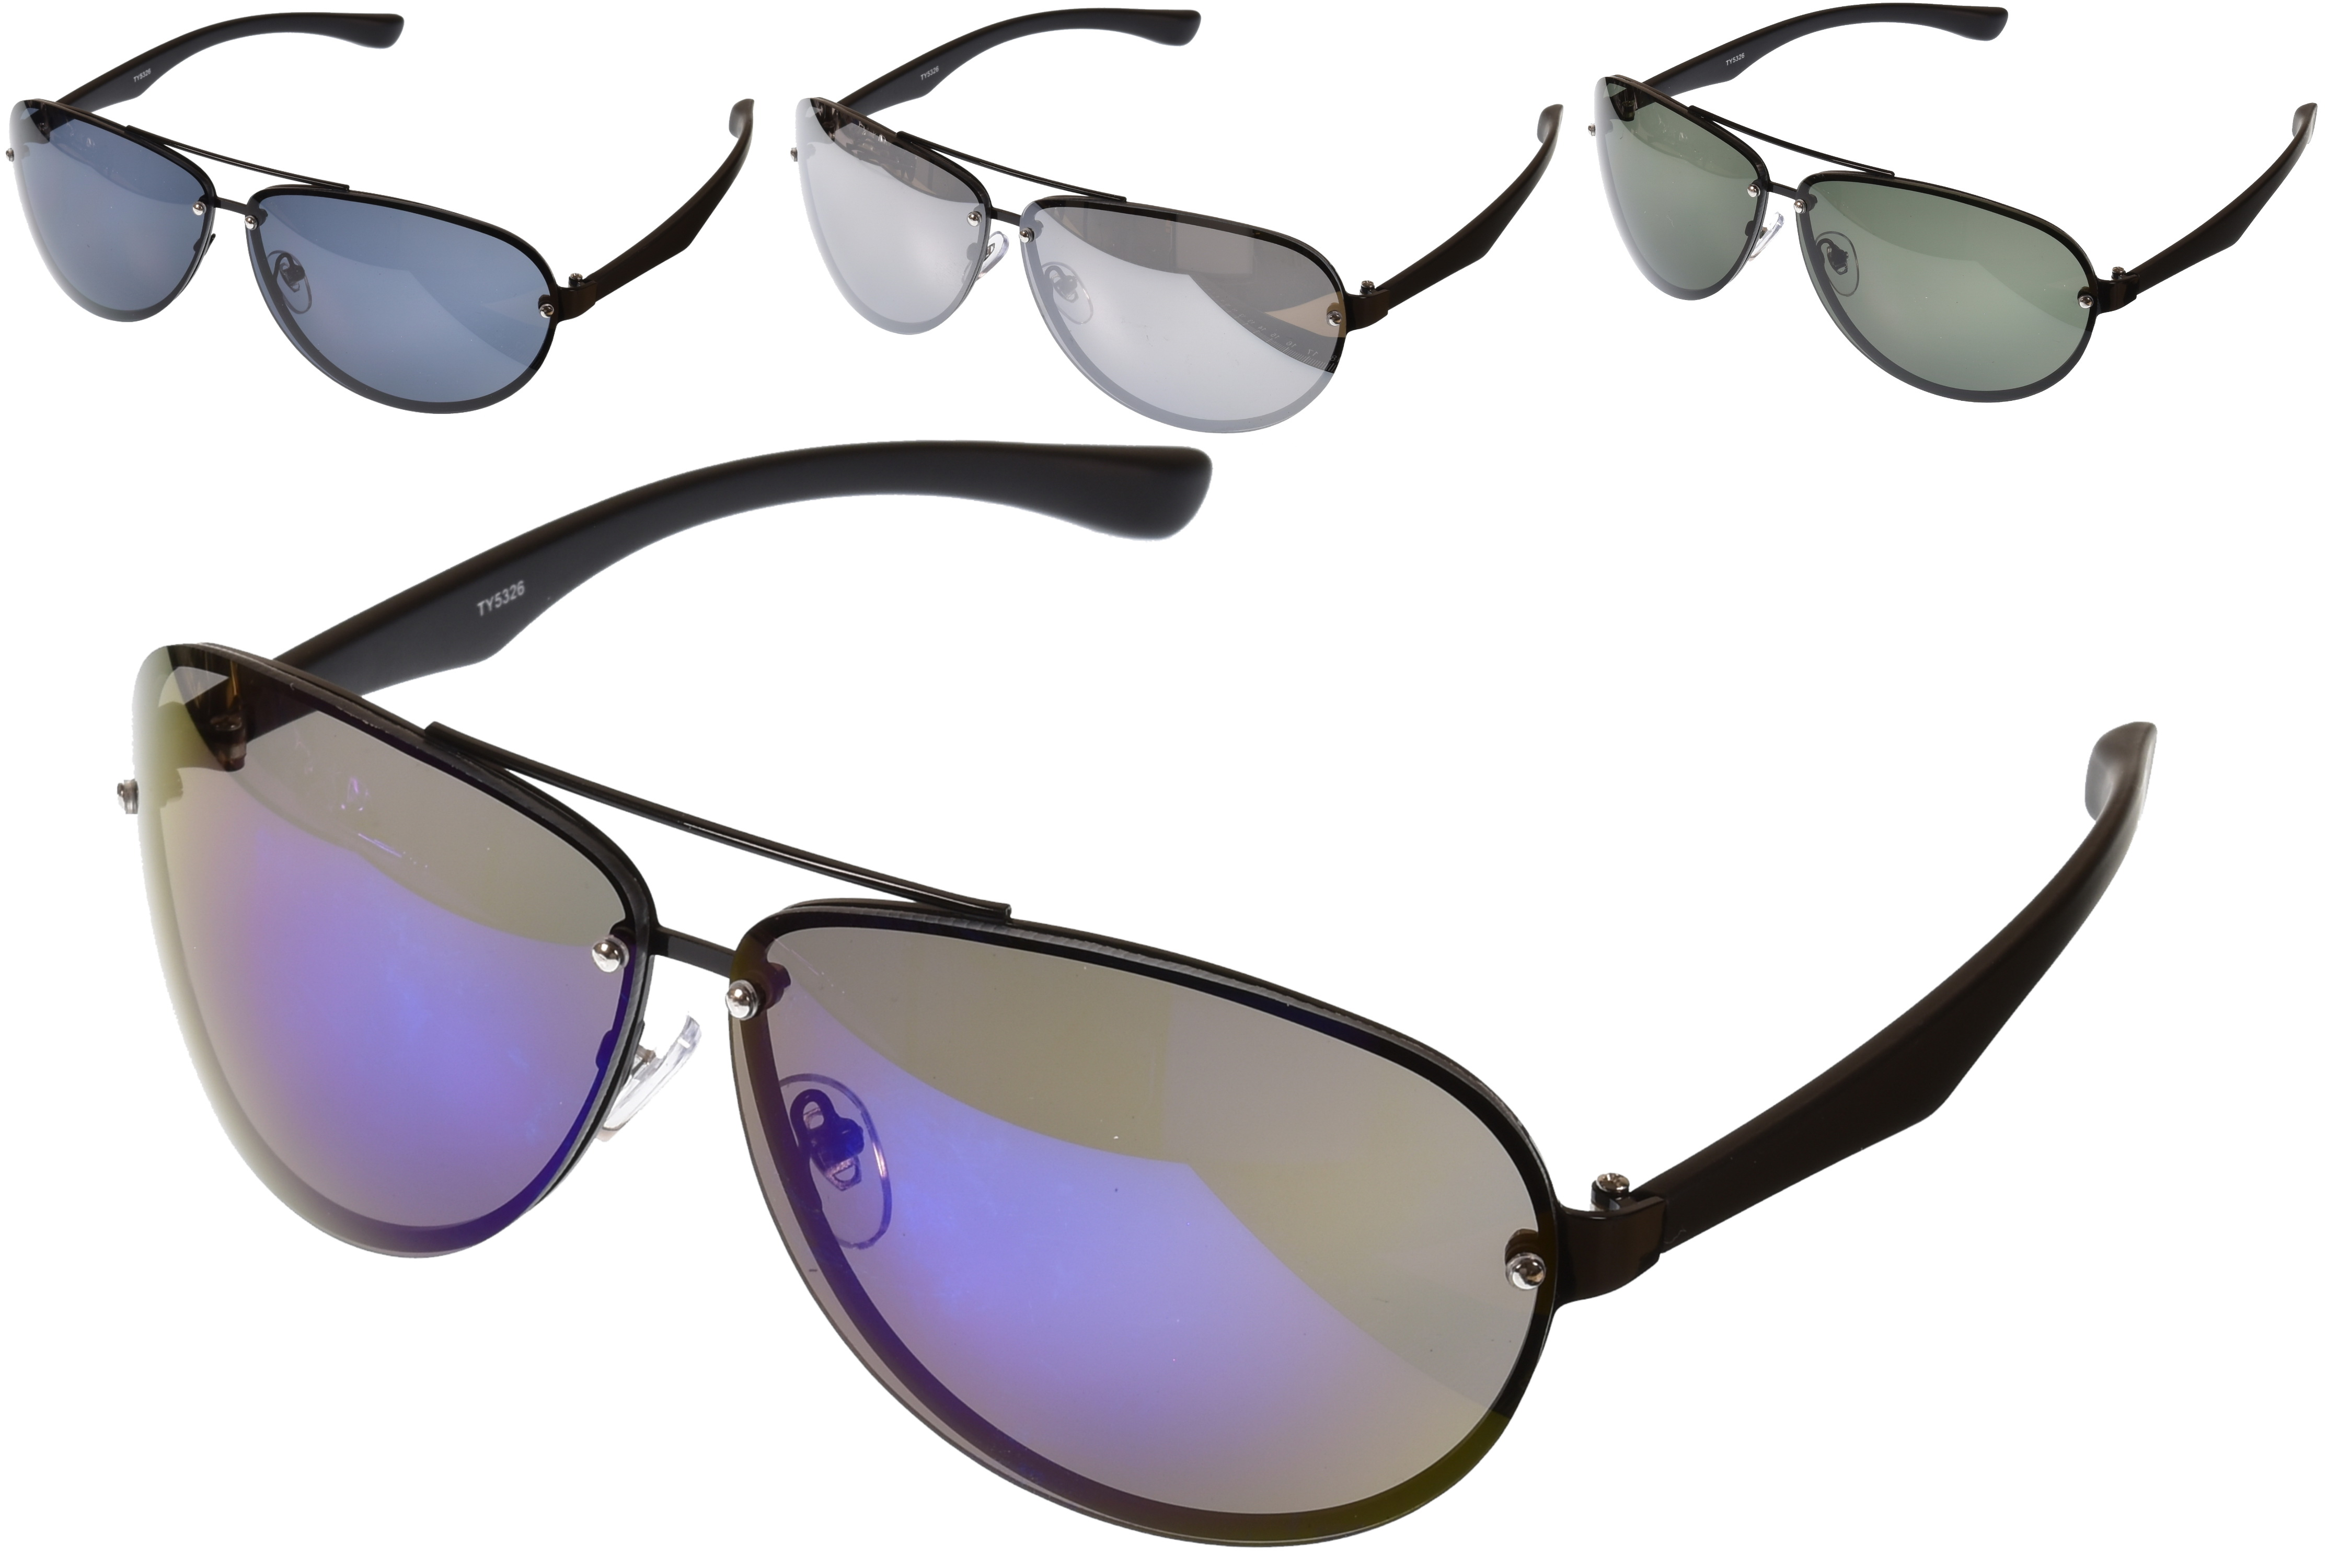 Mens Aviator Sunglasses Matt Black Arms - 4 Asst Lens